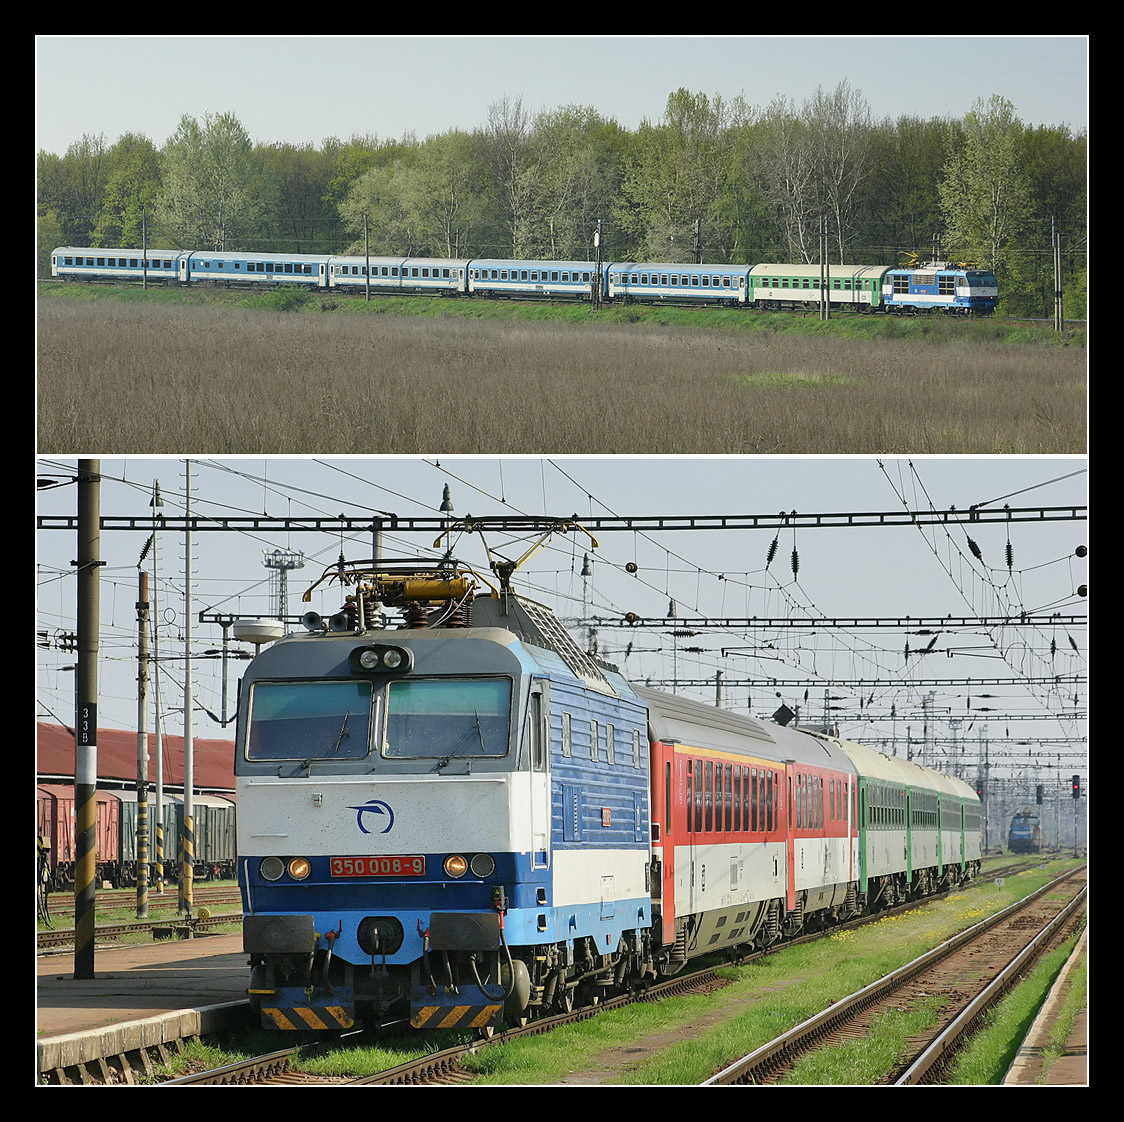 Regional Rail Express - 4: Vindobona IV (50 p ) | RailroadForums com